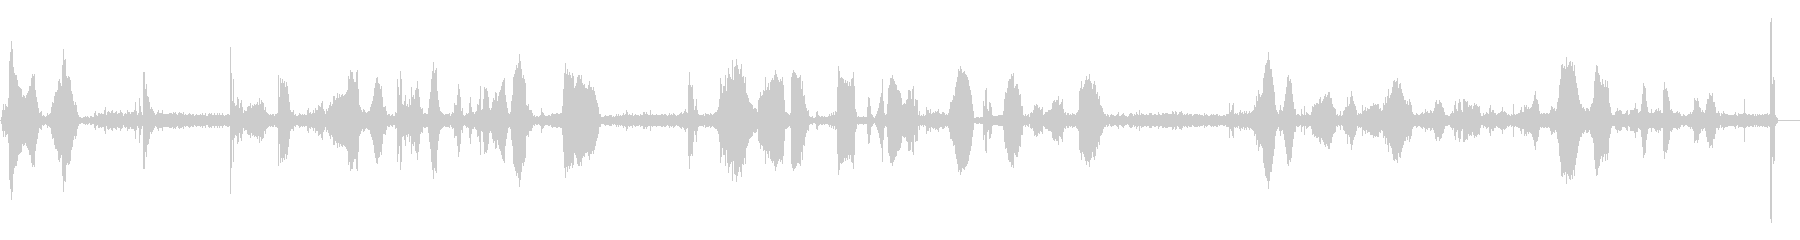 POLICE RADIO CALL...の未再生の波形